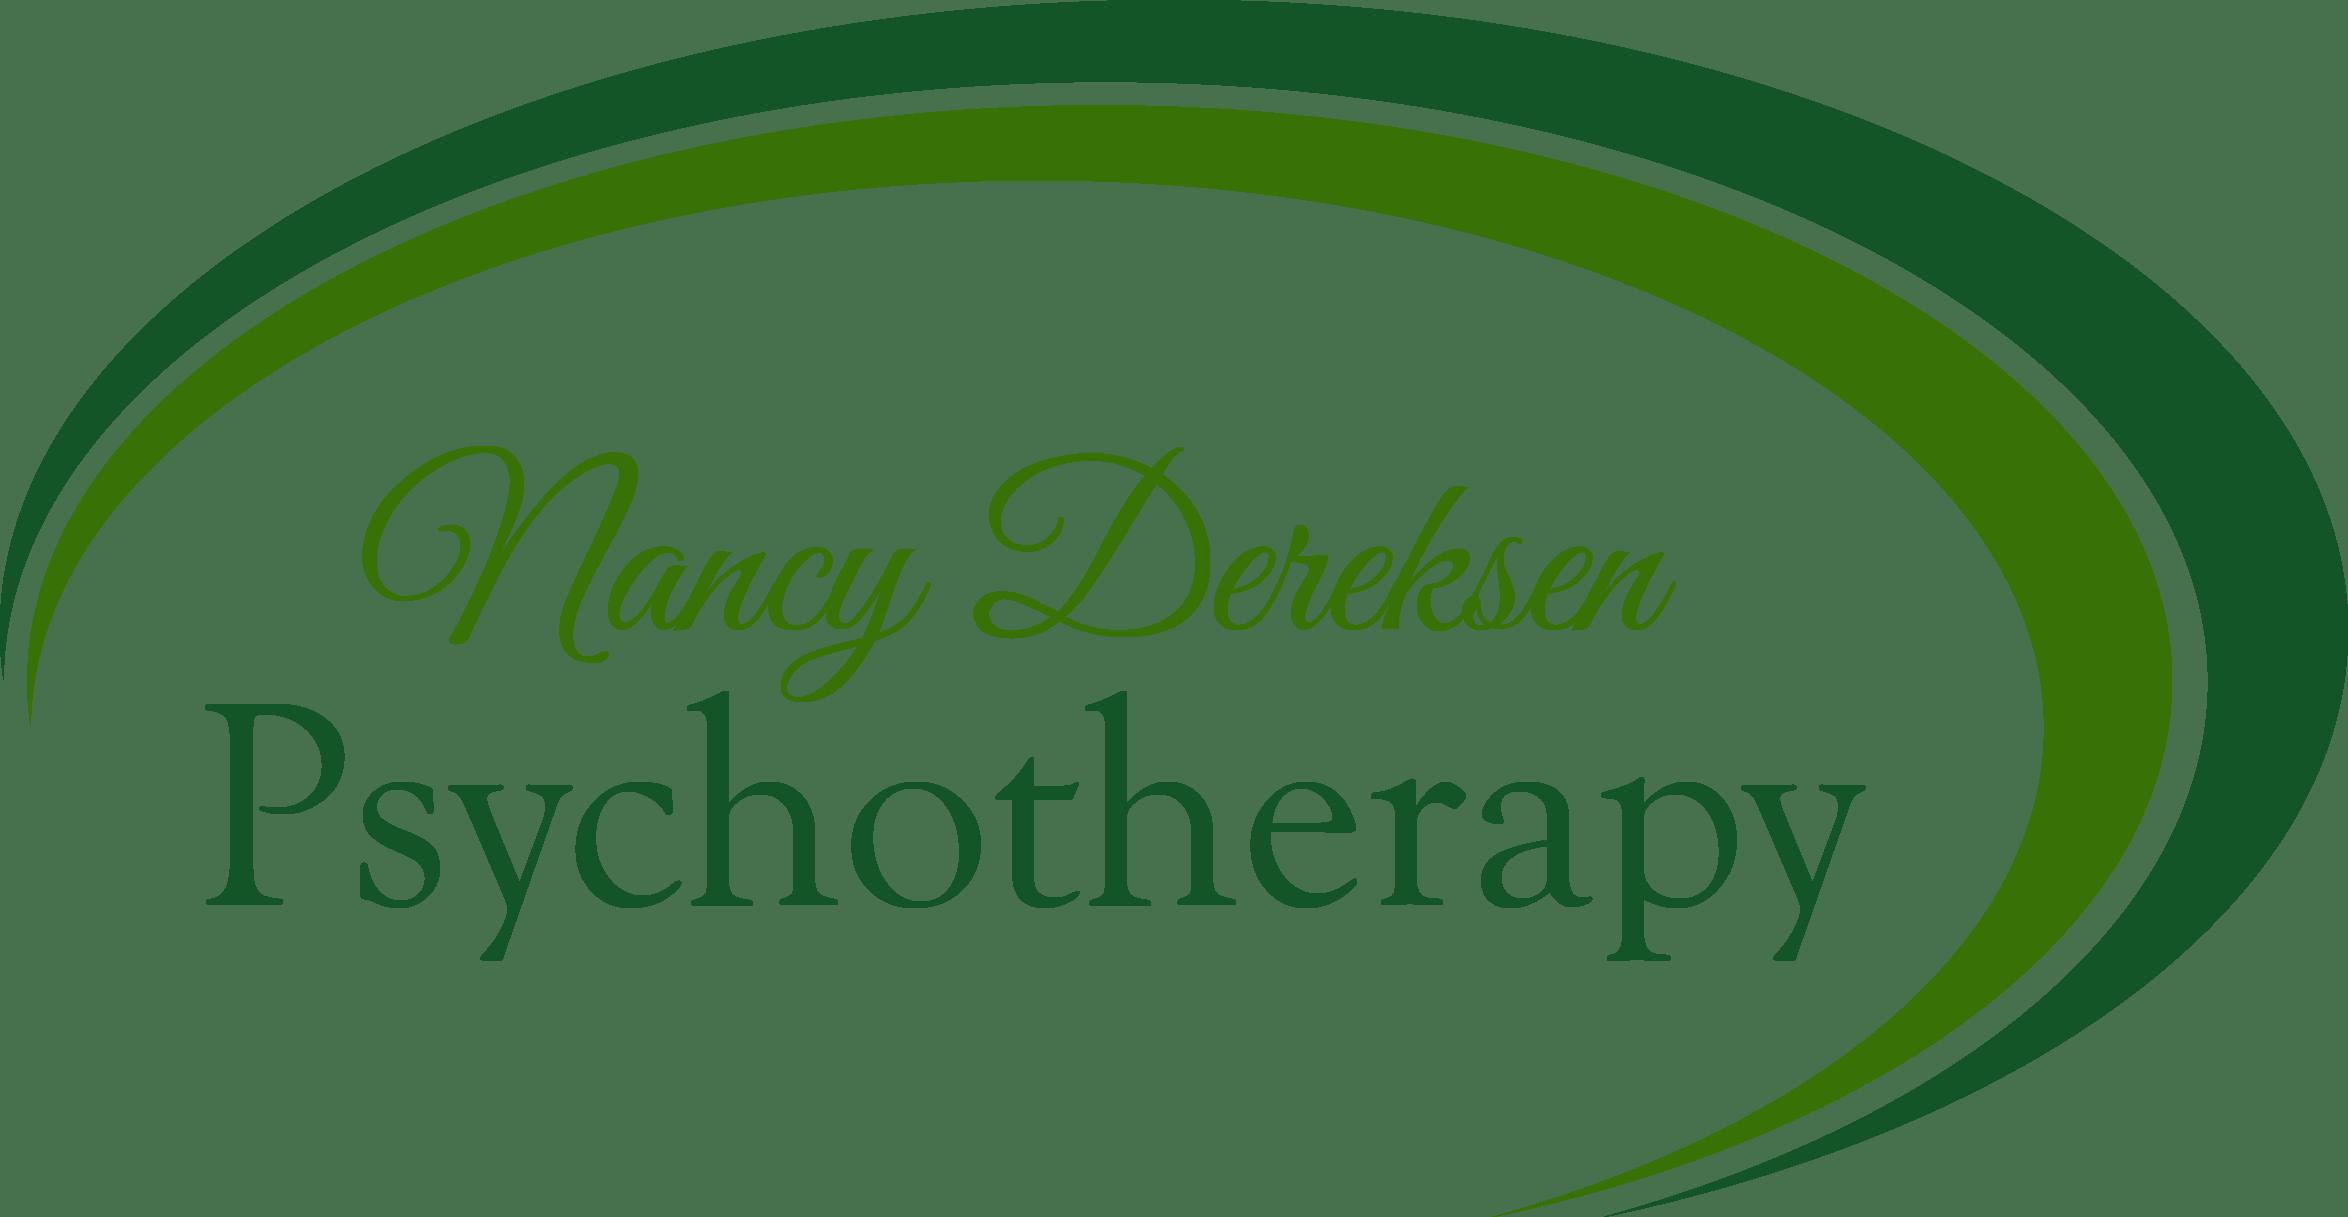 https://i0.wp.com/www.sumydesigns.com/wp-content/uploads/2016/06/Nancy_Dereksen_Logo.png?ssl=1